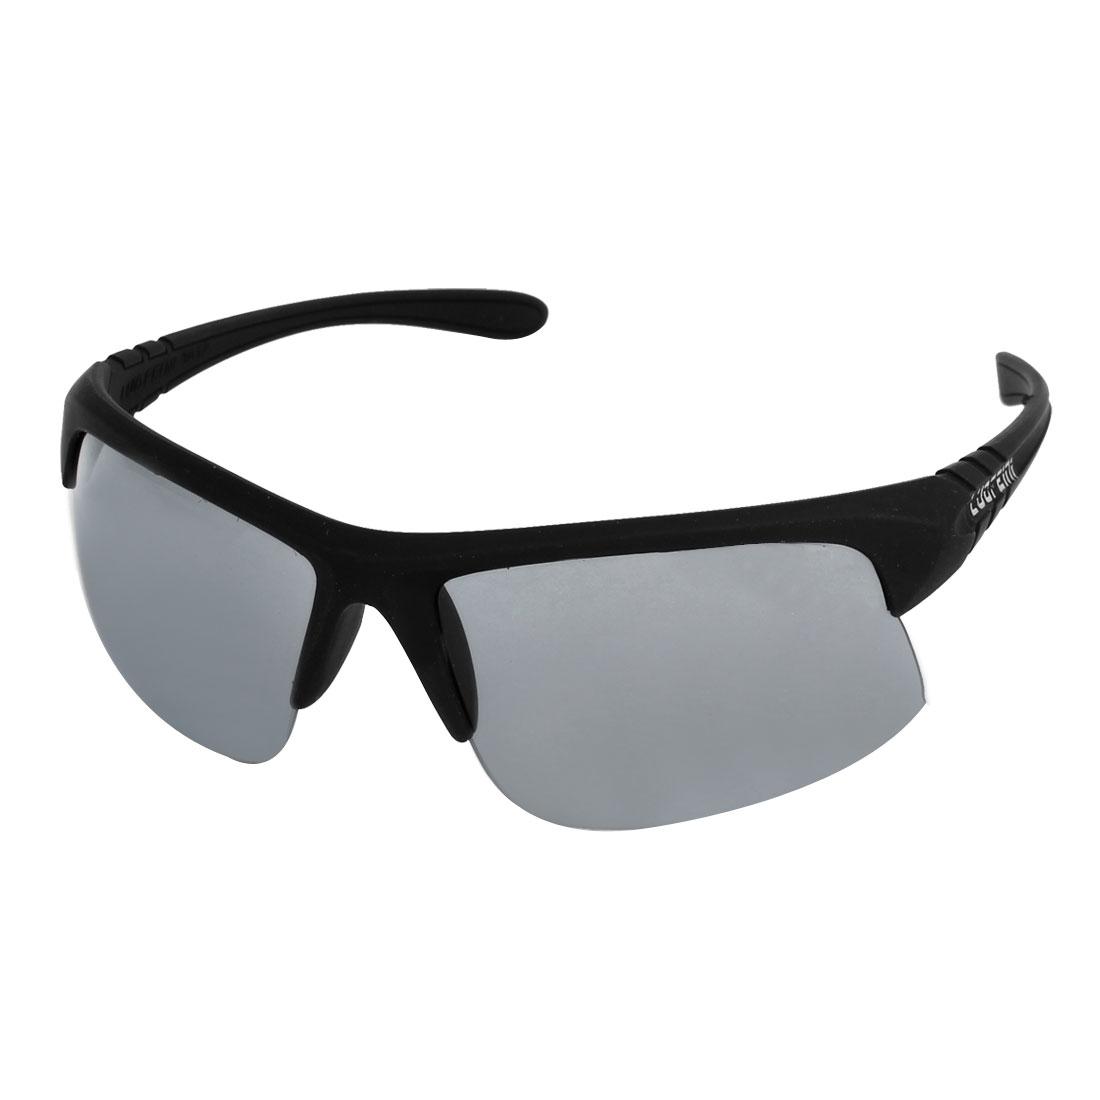 Outdoor Sports Plastic Half Rim Gray Lens Sunglasses Eyewear for Lady